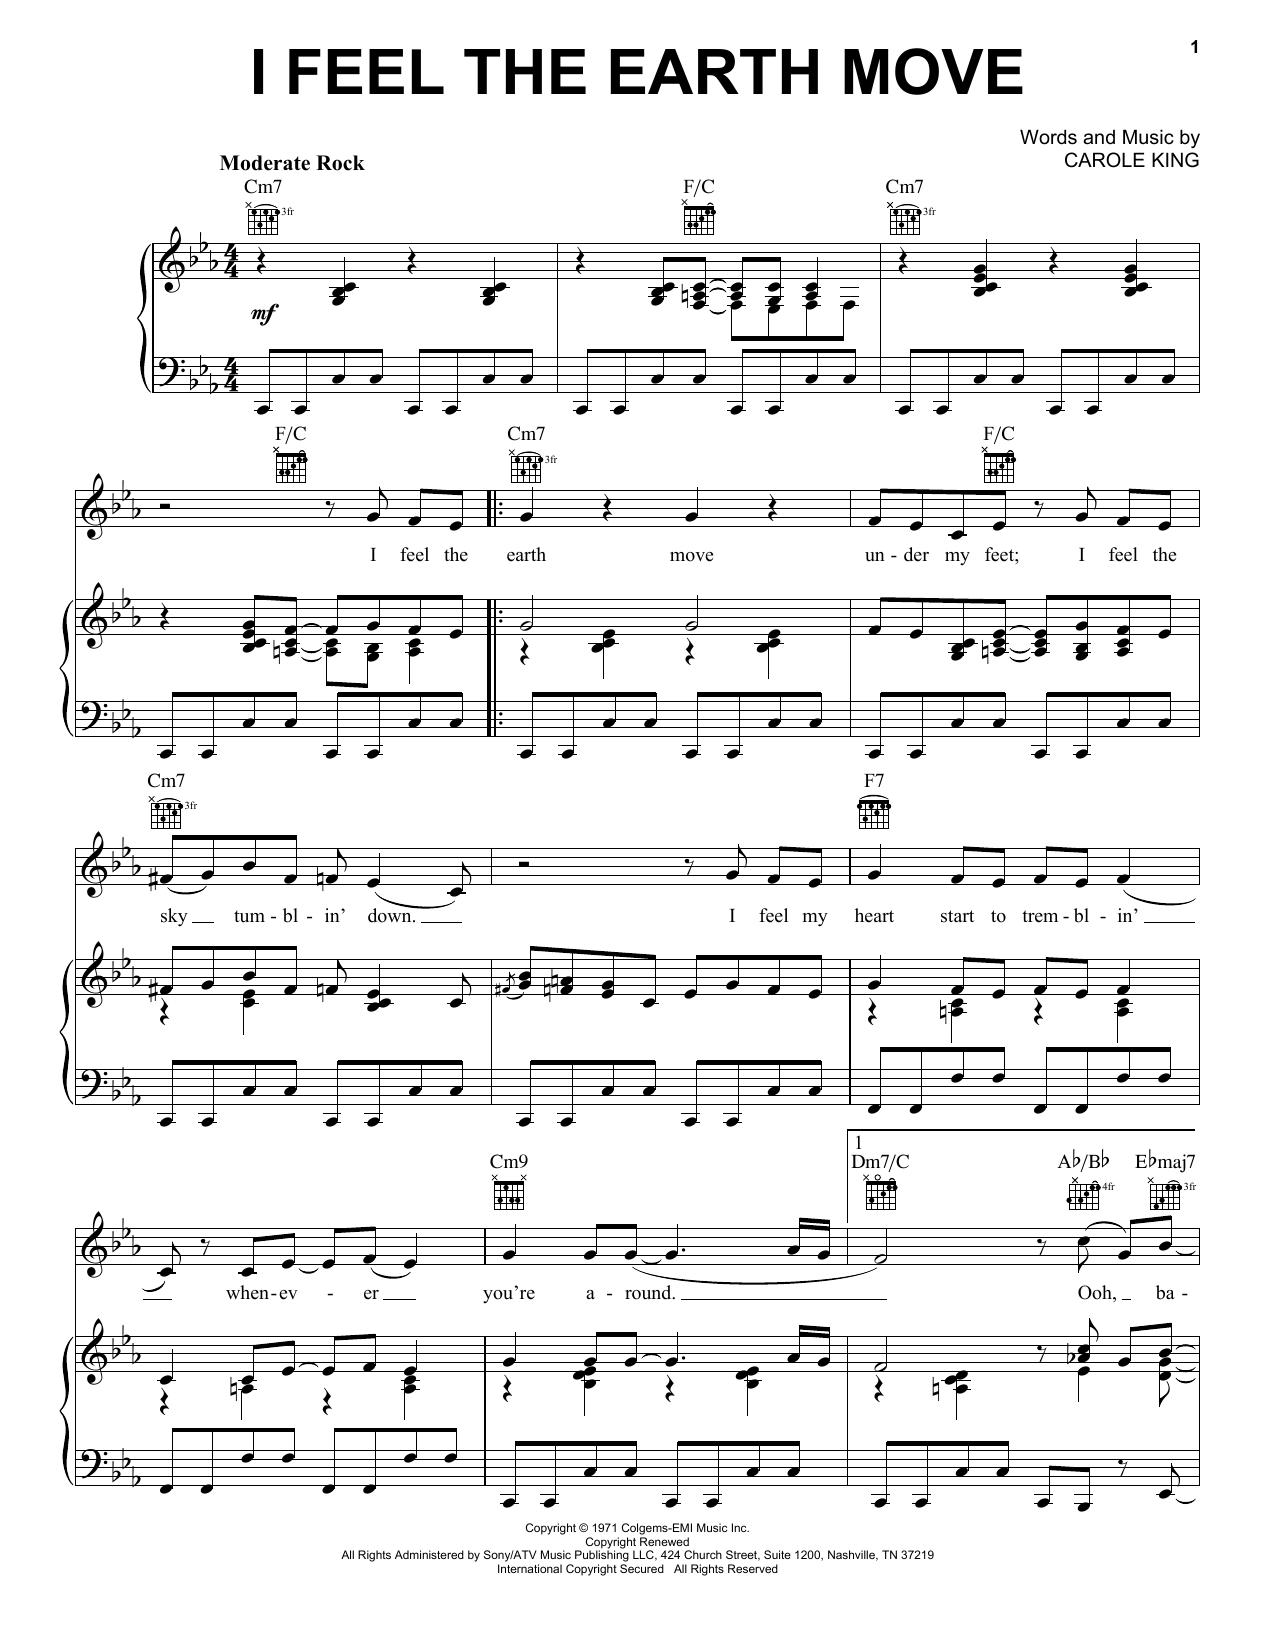 Carole King I Feel The Earth Move Sheet Music Notes Chords